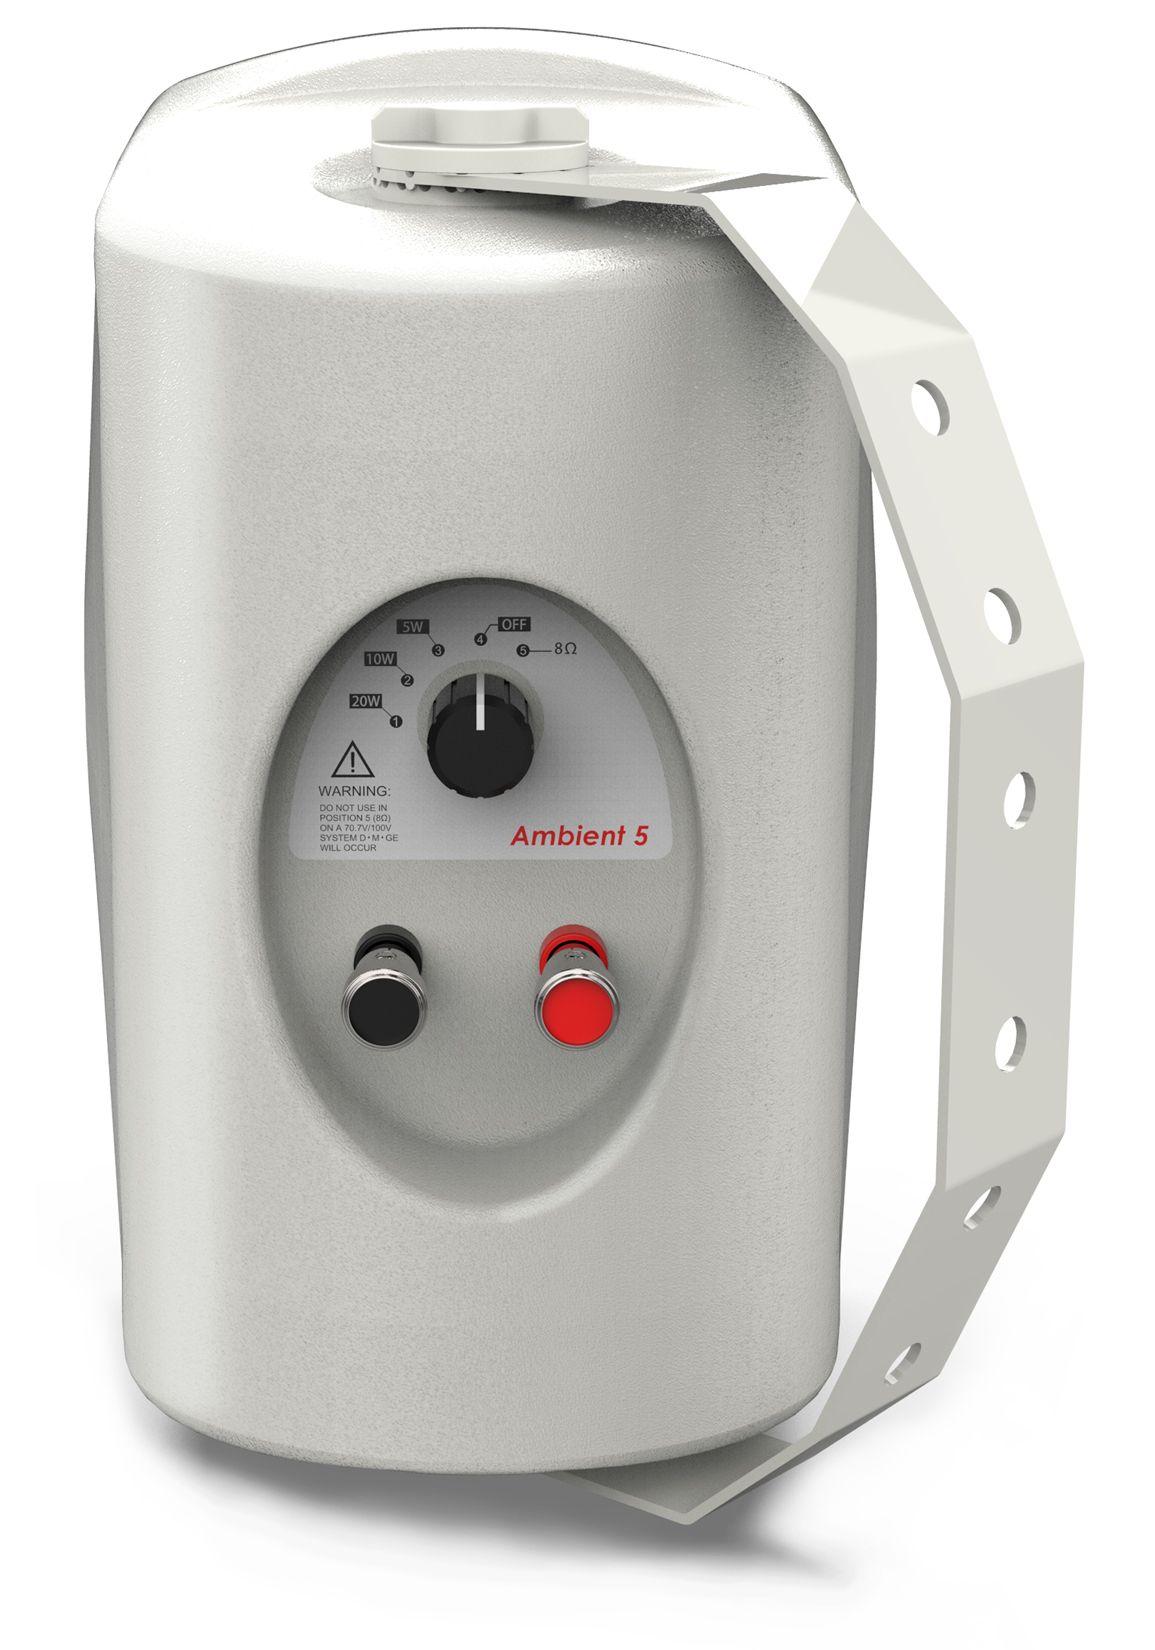 8 Ohm Audibax Ambient 5 White Pareja de Altavoces Pasivos Pared 5 Pulgadas 100v